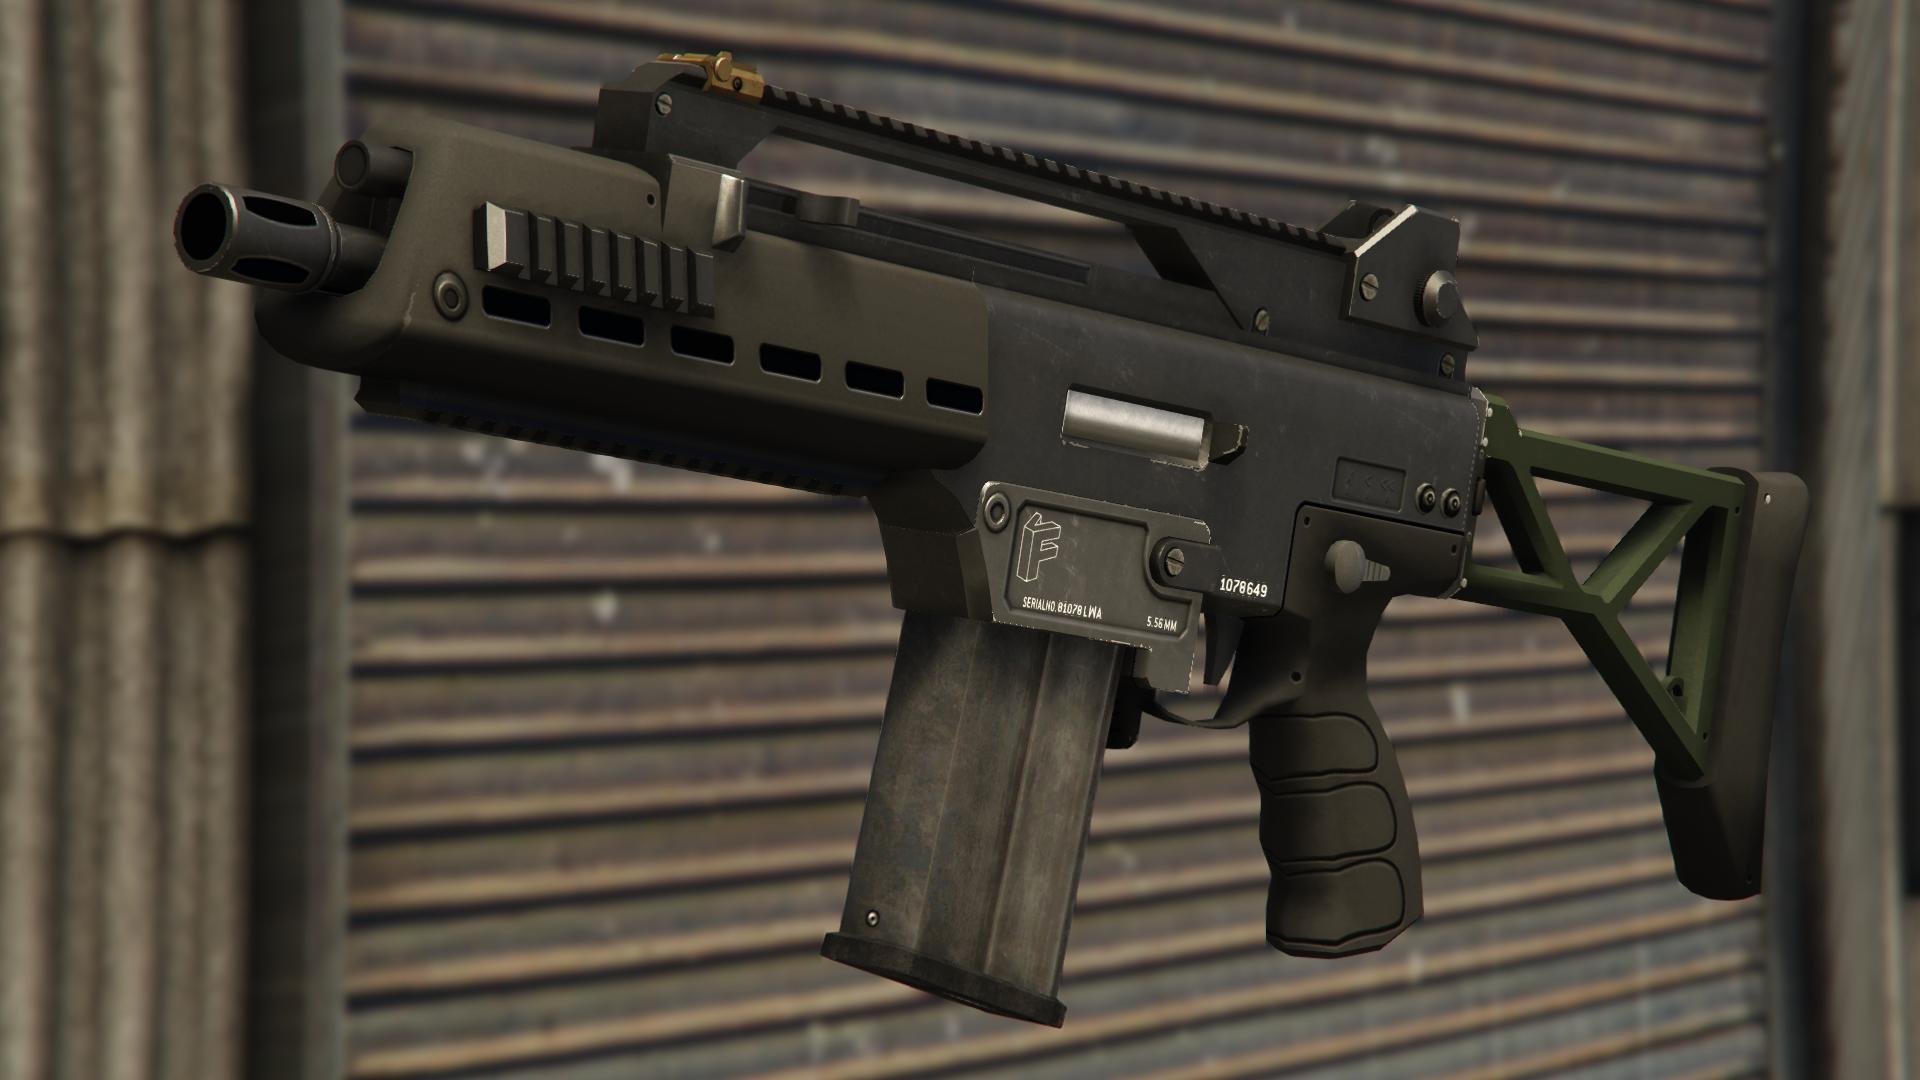 SpecialCarbine-GTAV.png